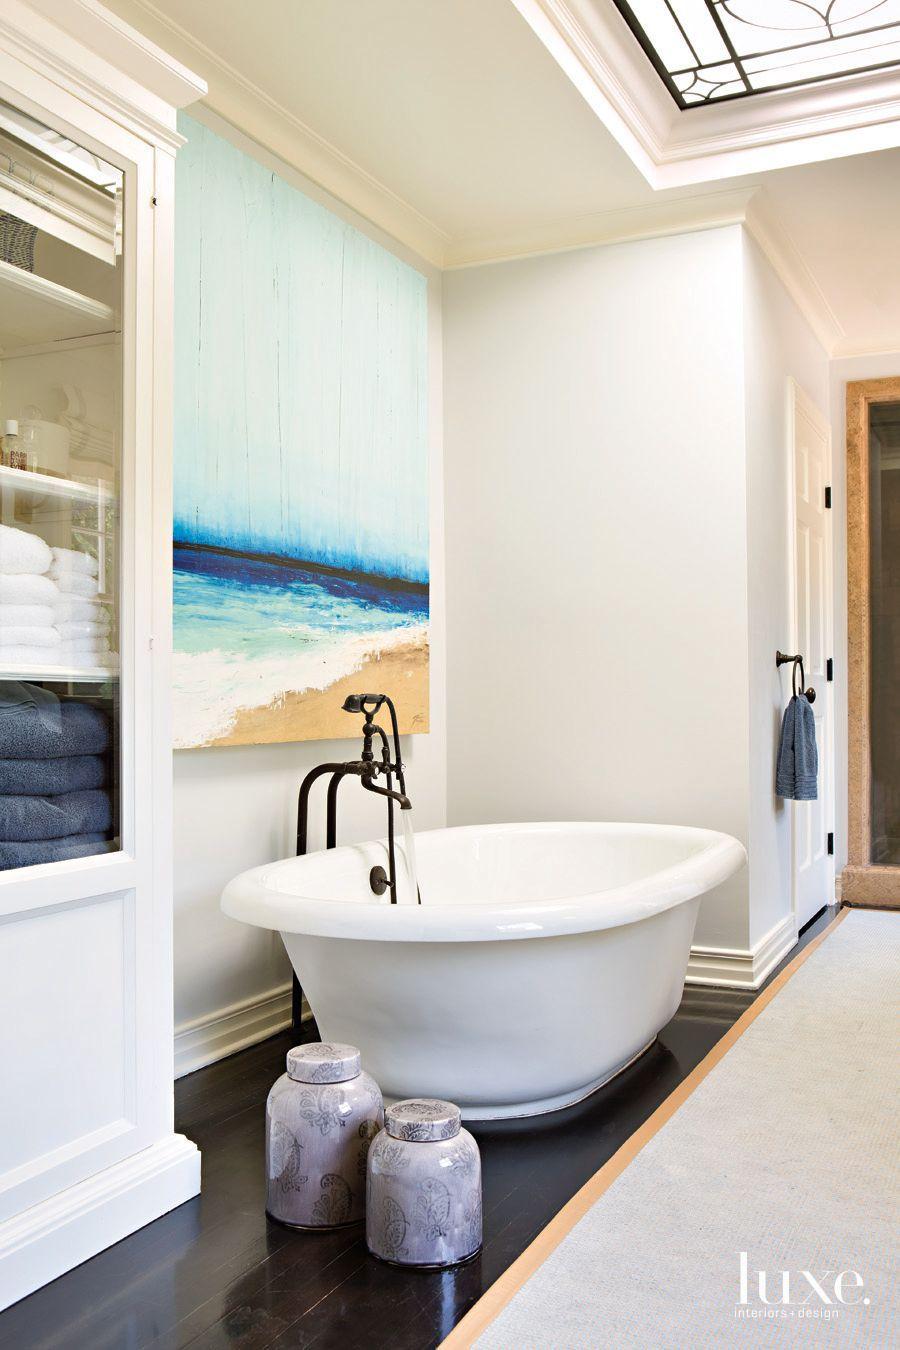 LuxeSource | Luxe Interiors + Design Magazine | The Destination ...